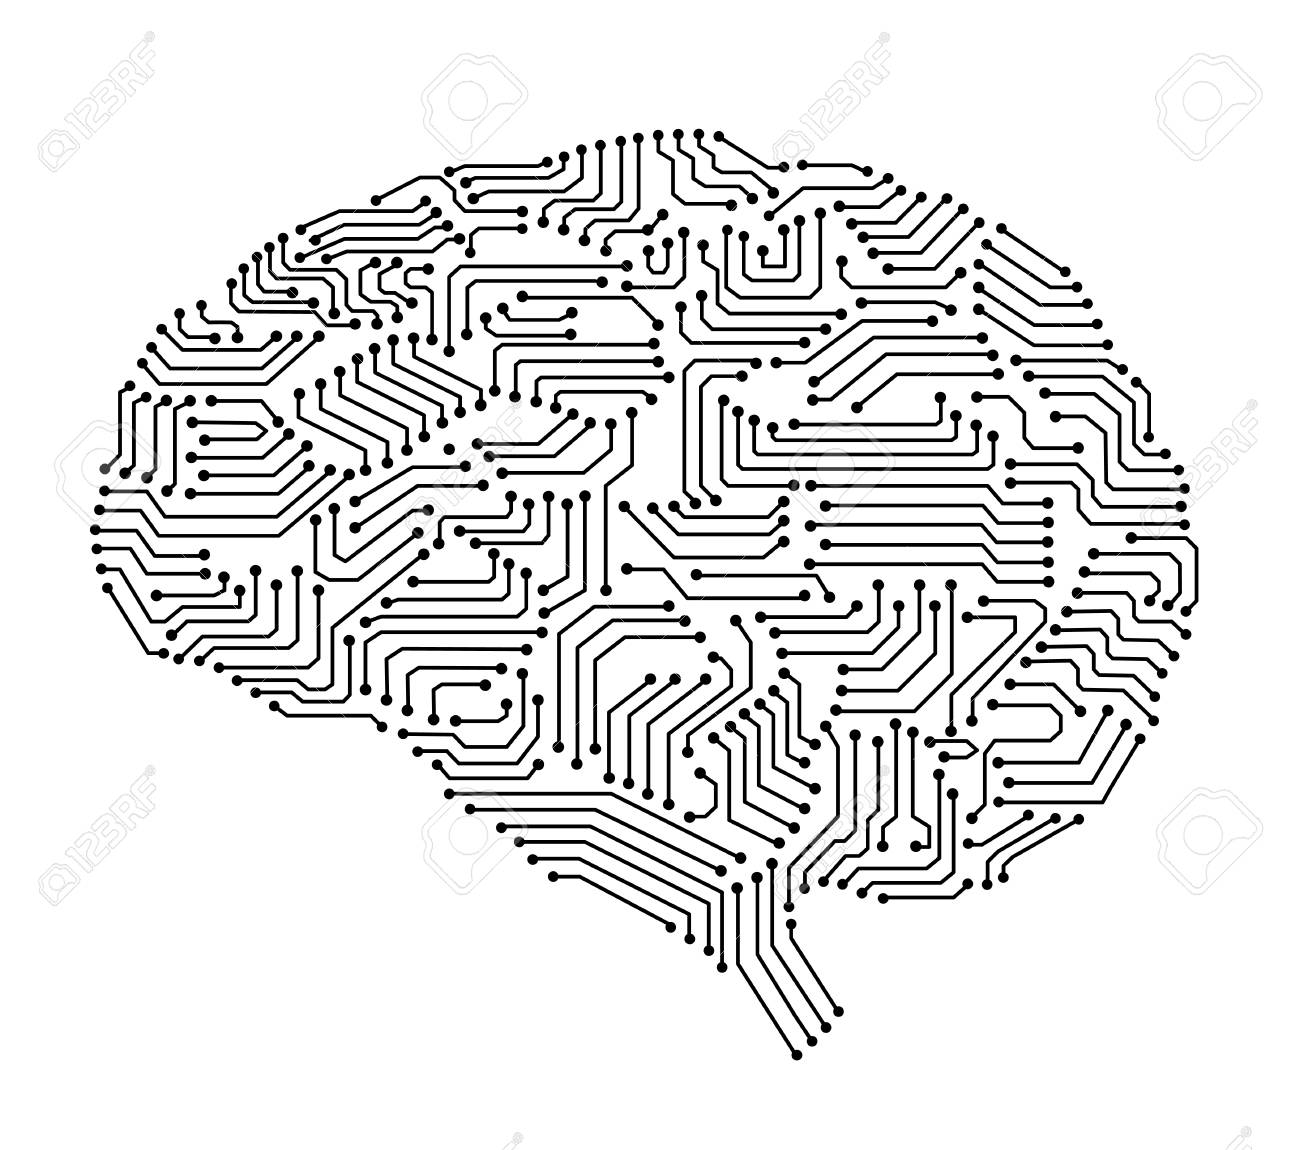 side vector circboard wiring diagram artificial intelligence brain or circuit board in brain shape  circuit board in brain shape